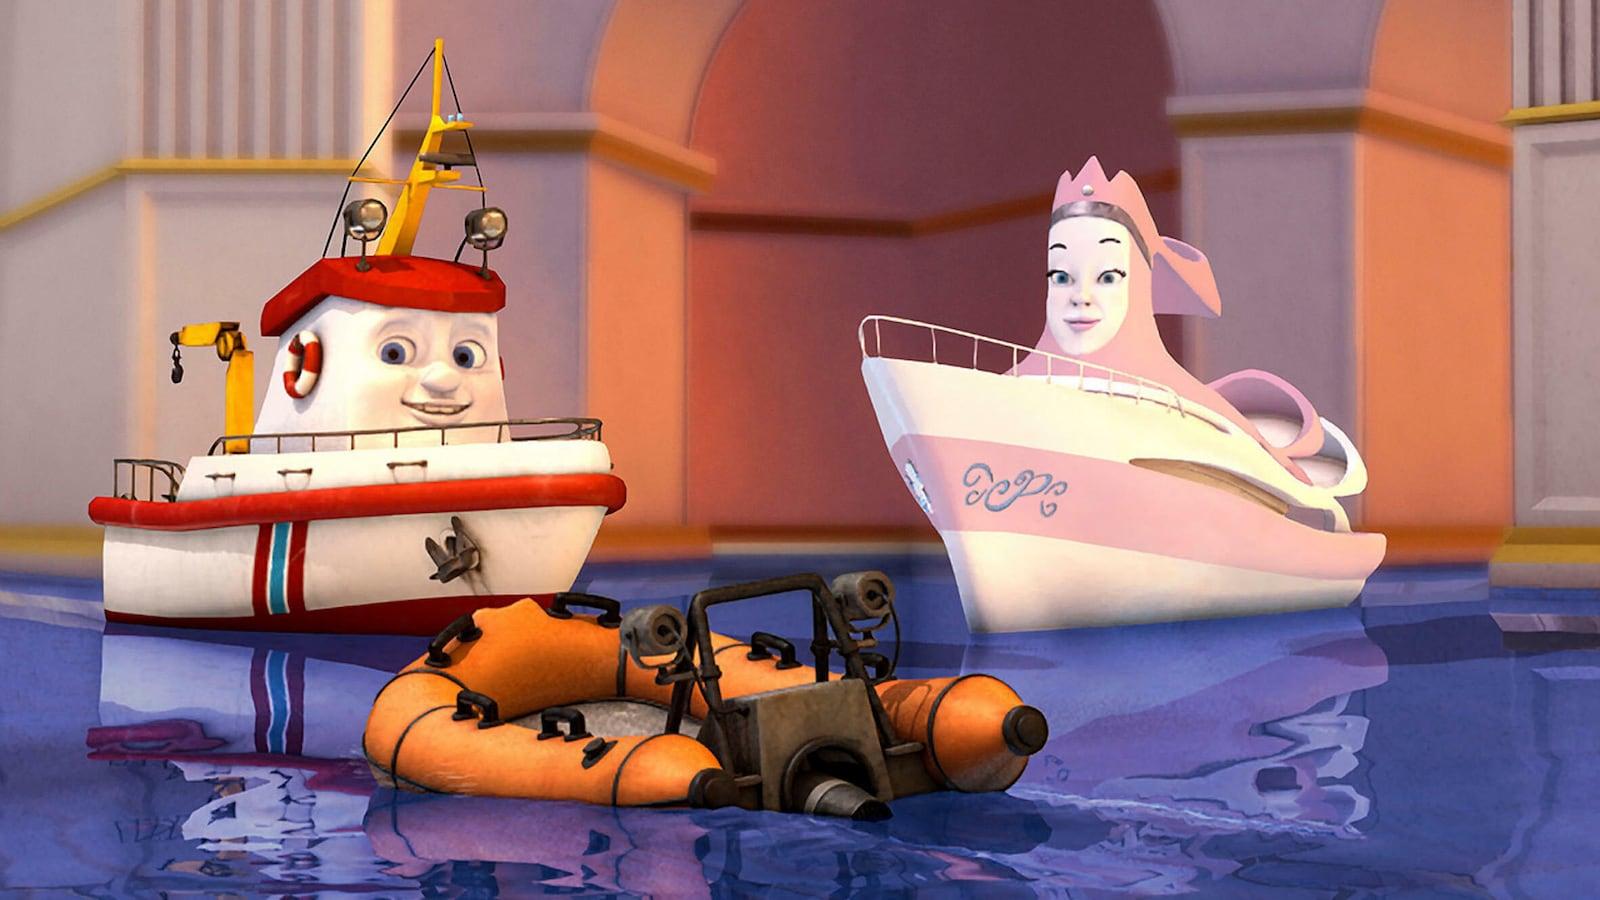 Elias ja kuninkaan laiva